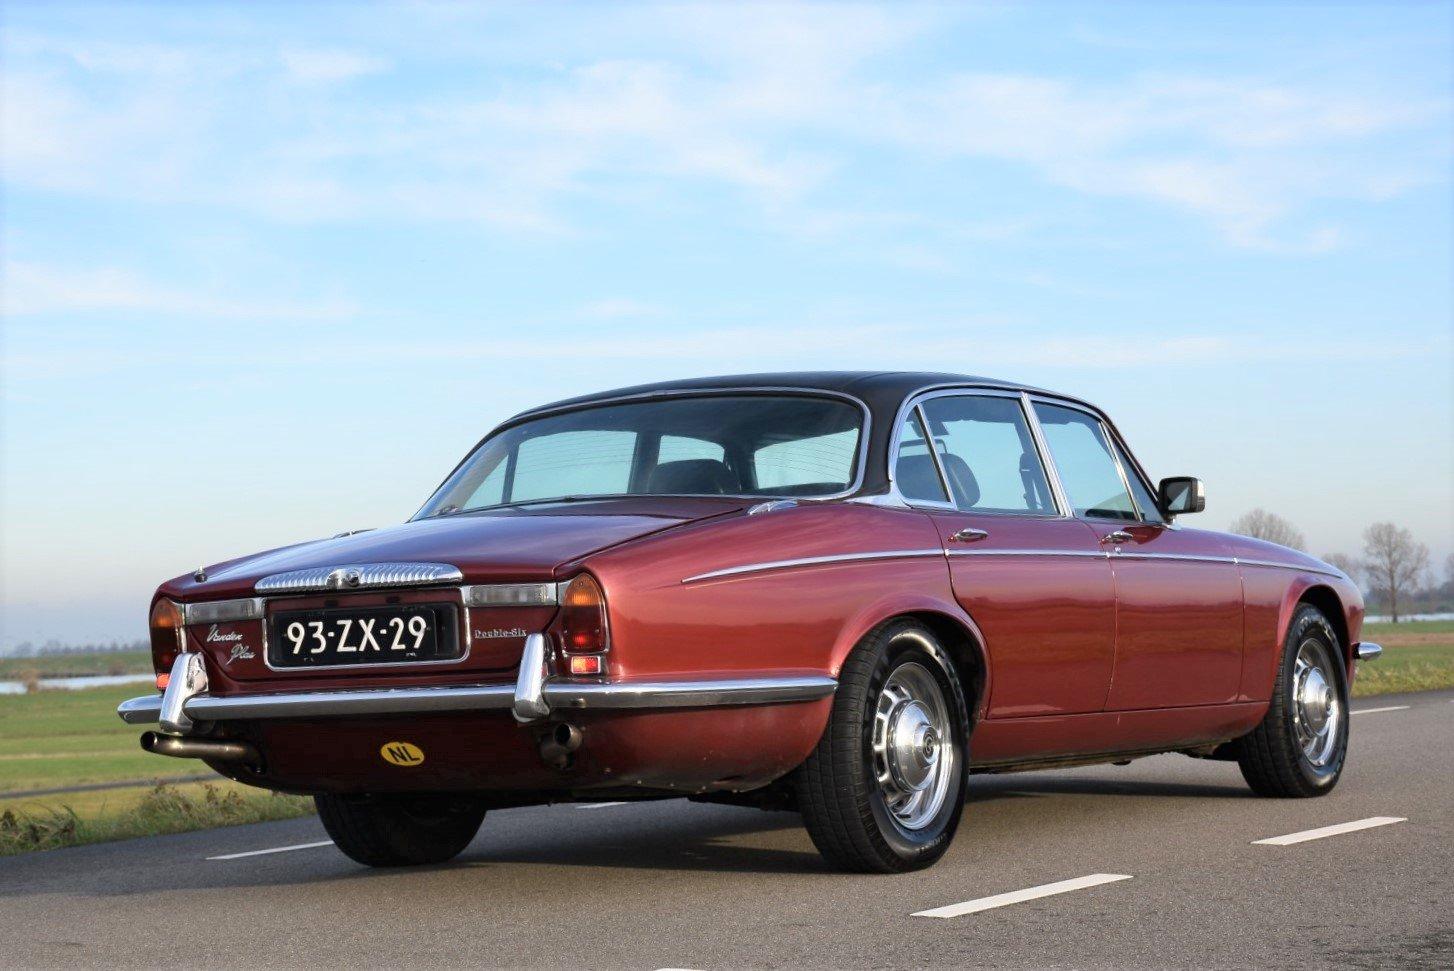 1978 Daimler Double Six Vanden Plas  For Sale (picture 6 of 6)